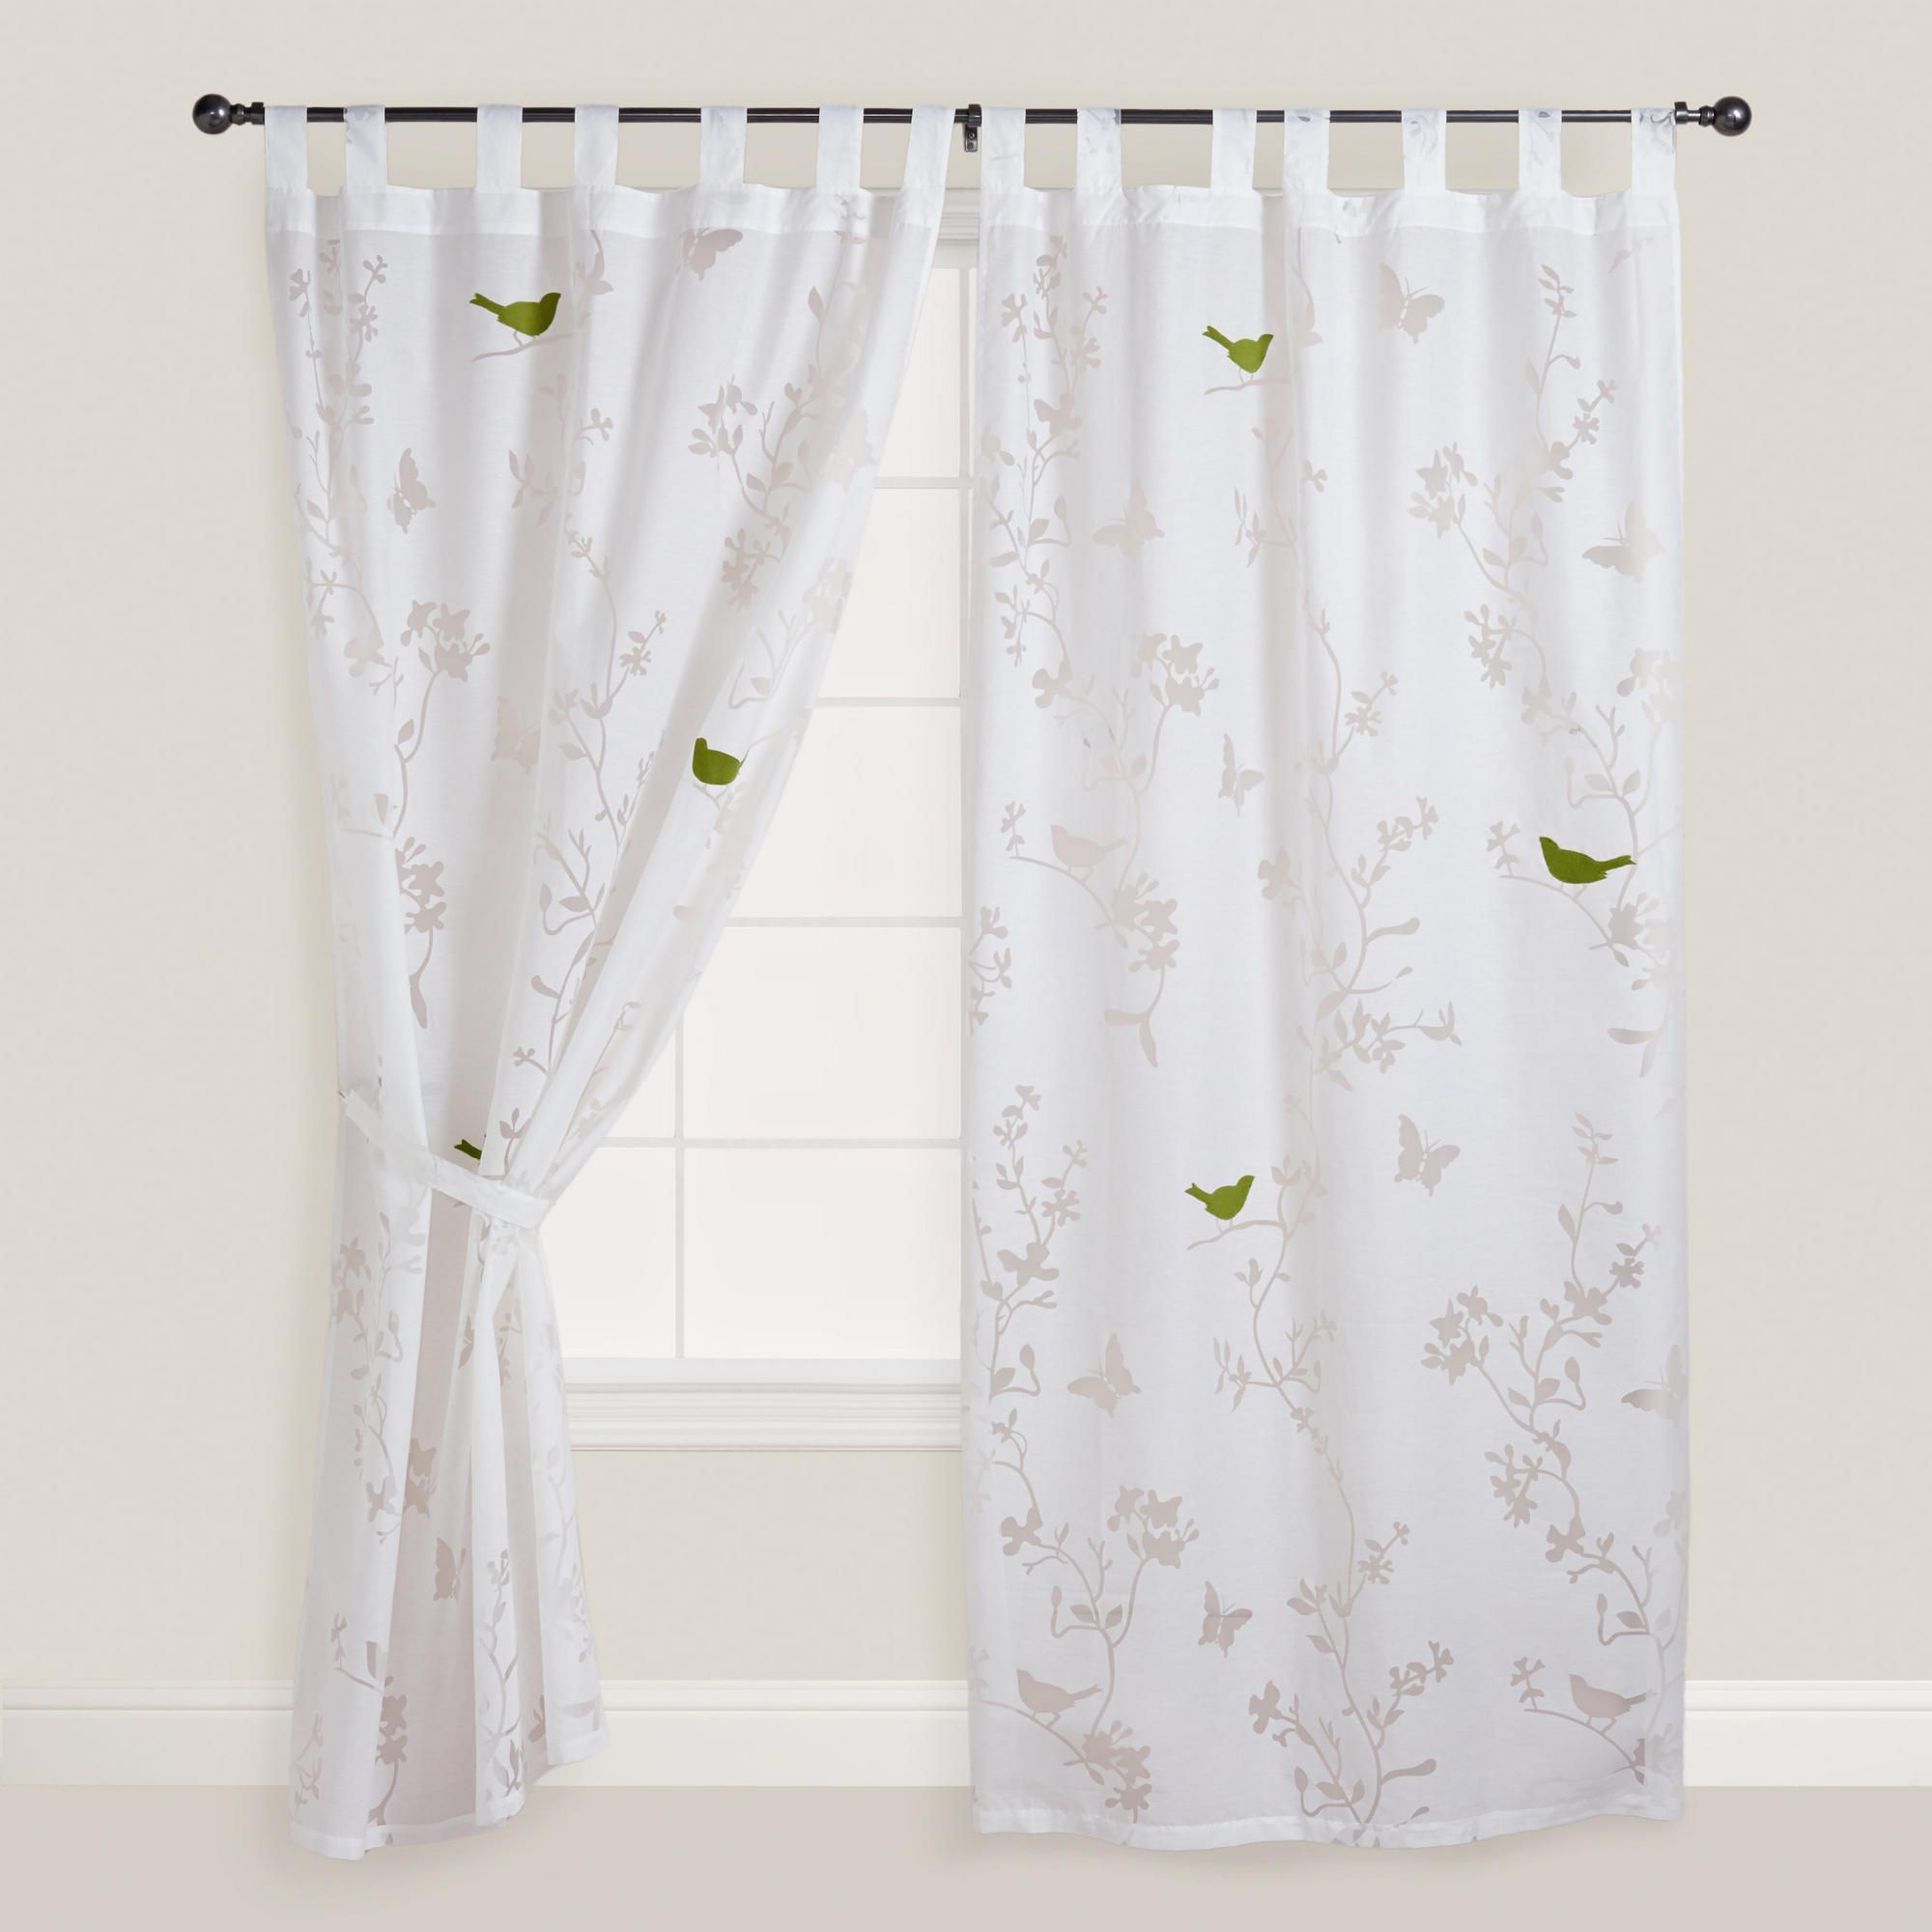 Birch Tree Curtain Panels